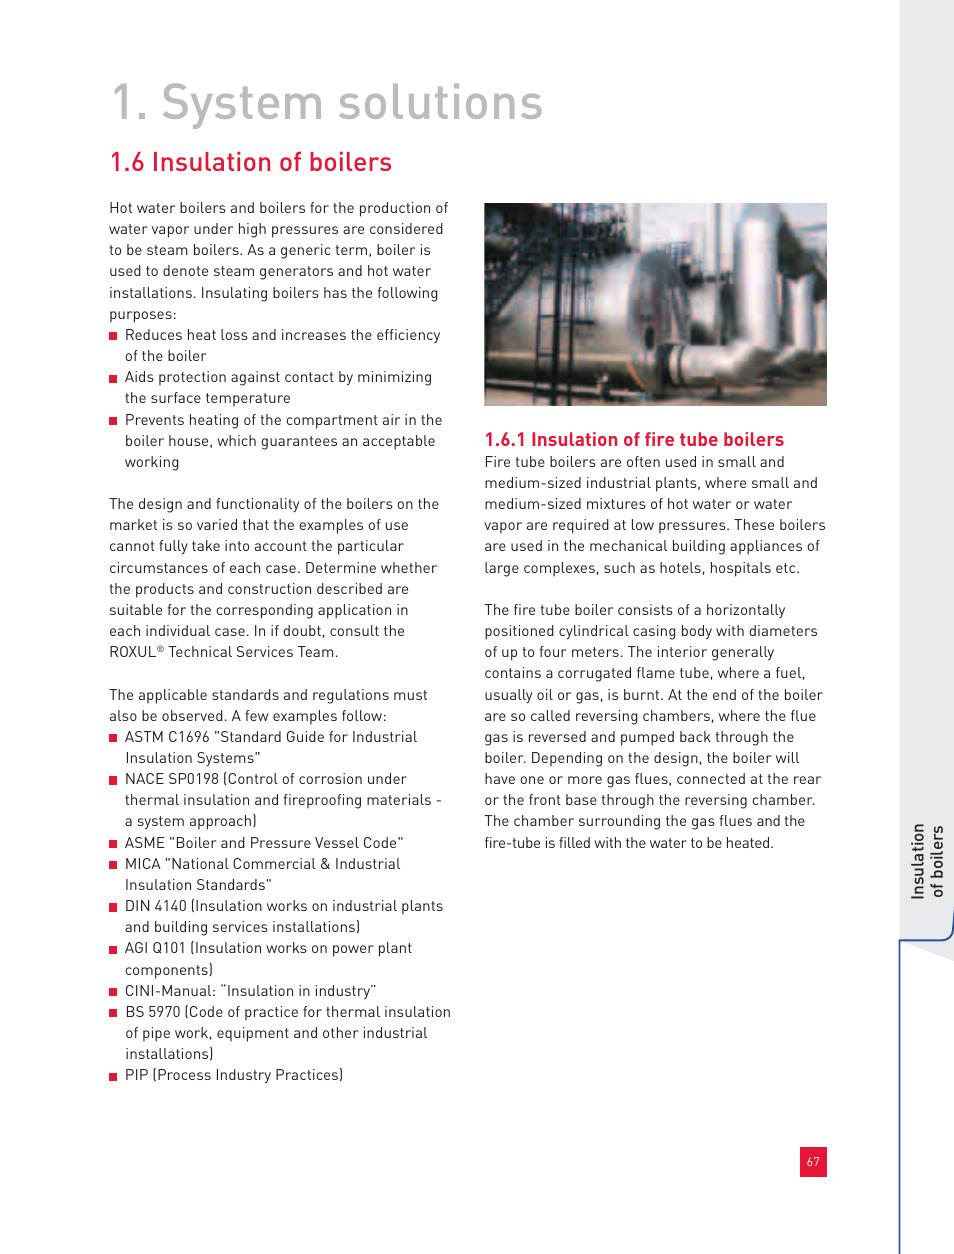 system solutions 6 insulation of boilers roxul industrial rh manualsdir com  cini insulation manual scribd